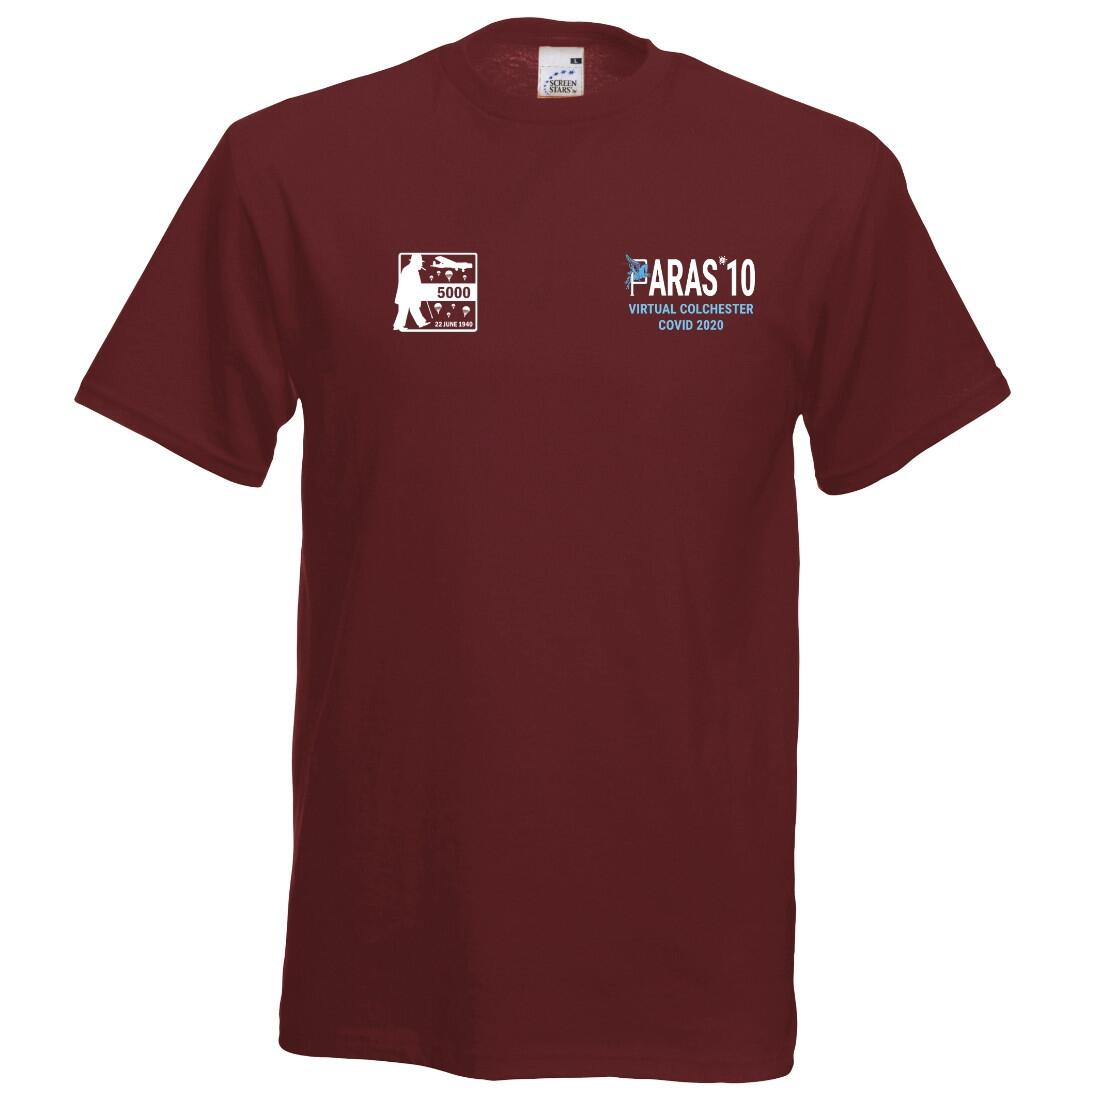 Paras' 10 Virtual Colchester Covid 2020 T-Shirt